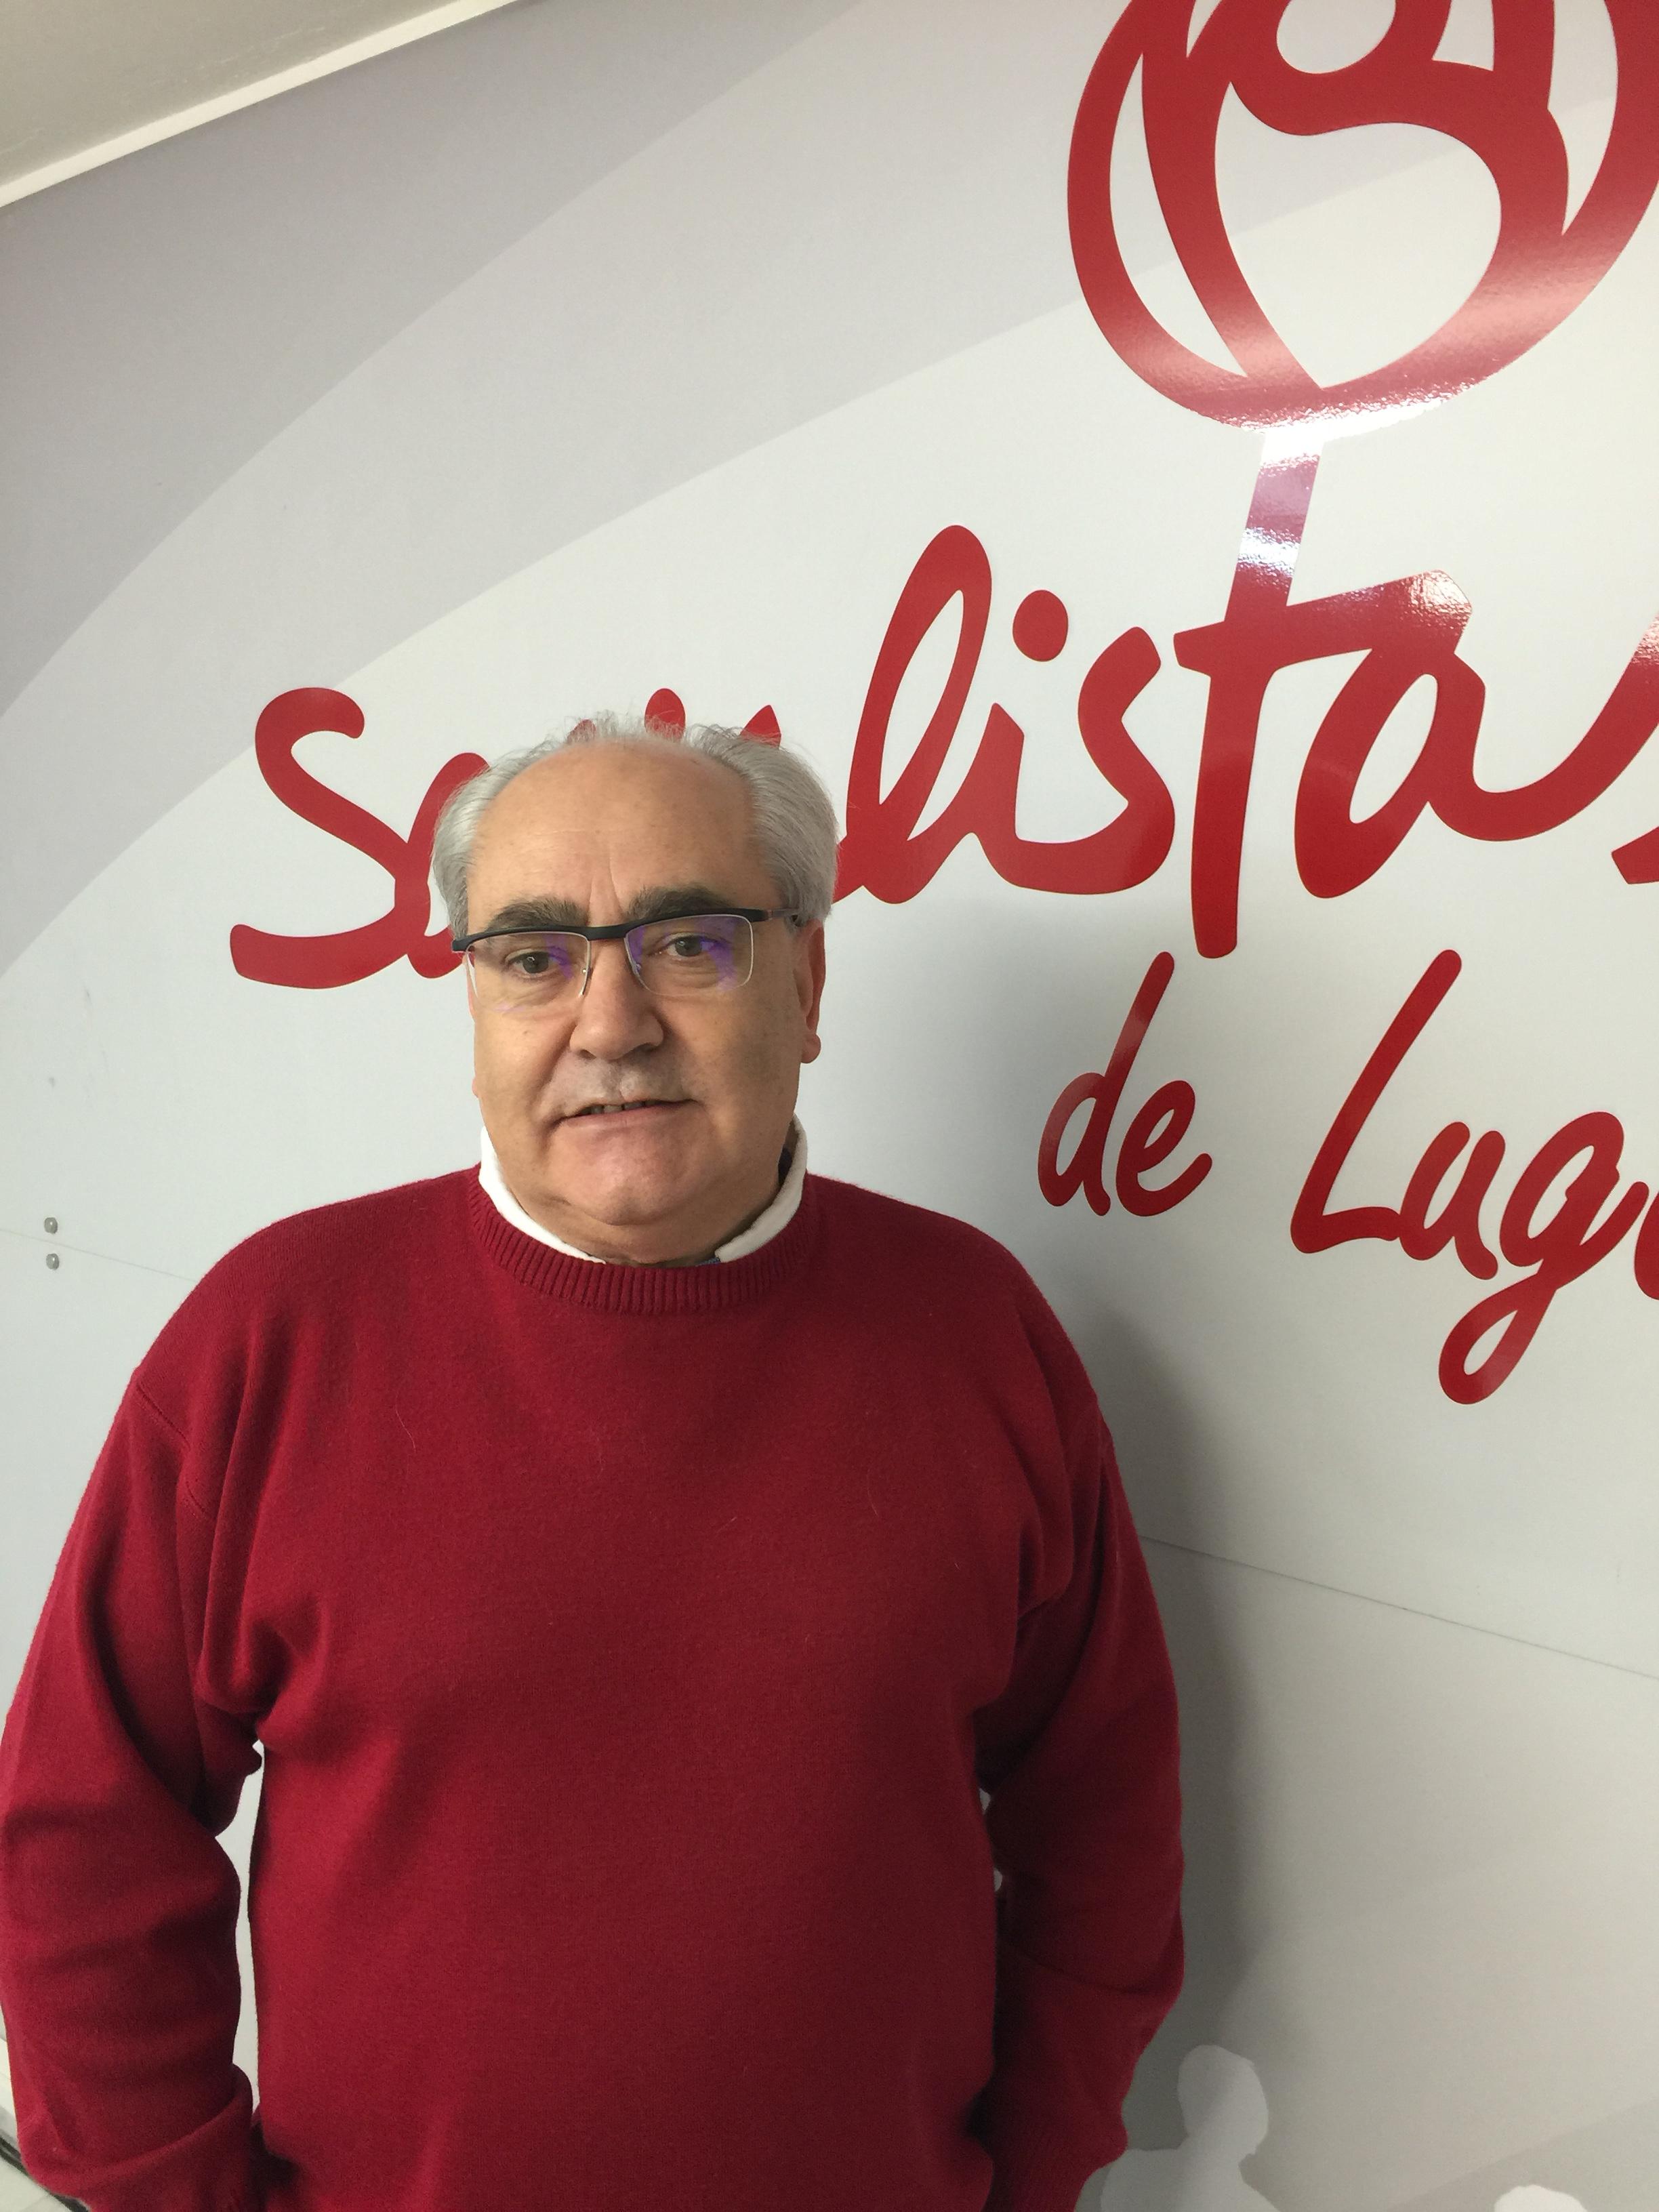 Luis Ángel Lago Lage